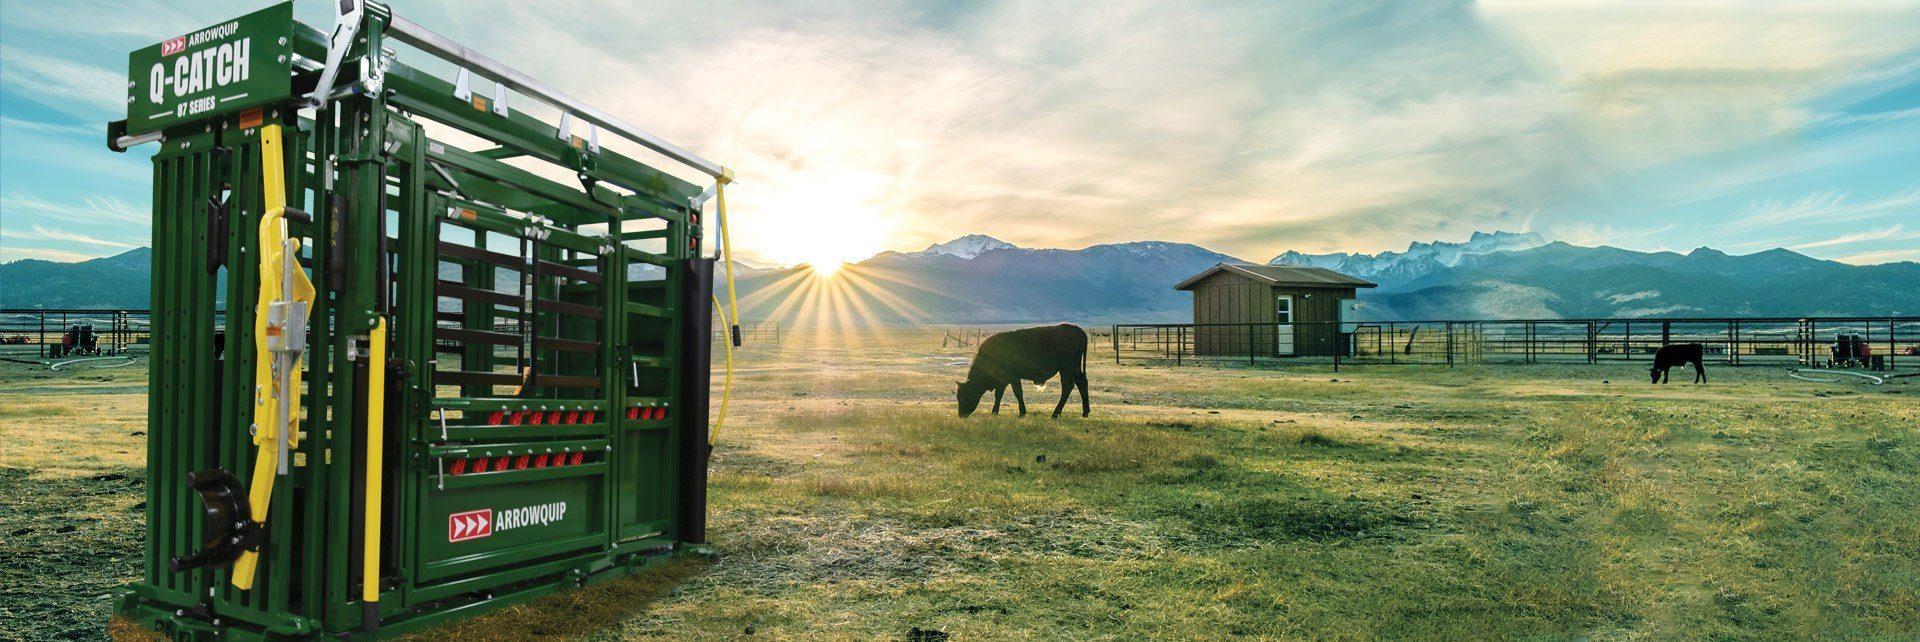 Q-Catch 87 Series cattle crush in a field with cattle